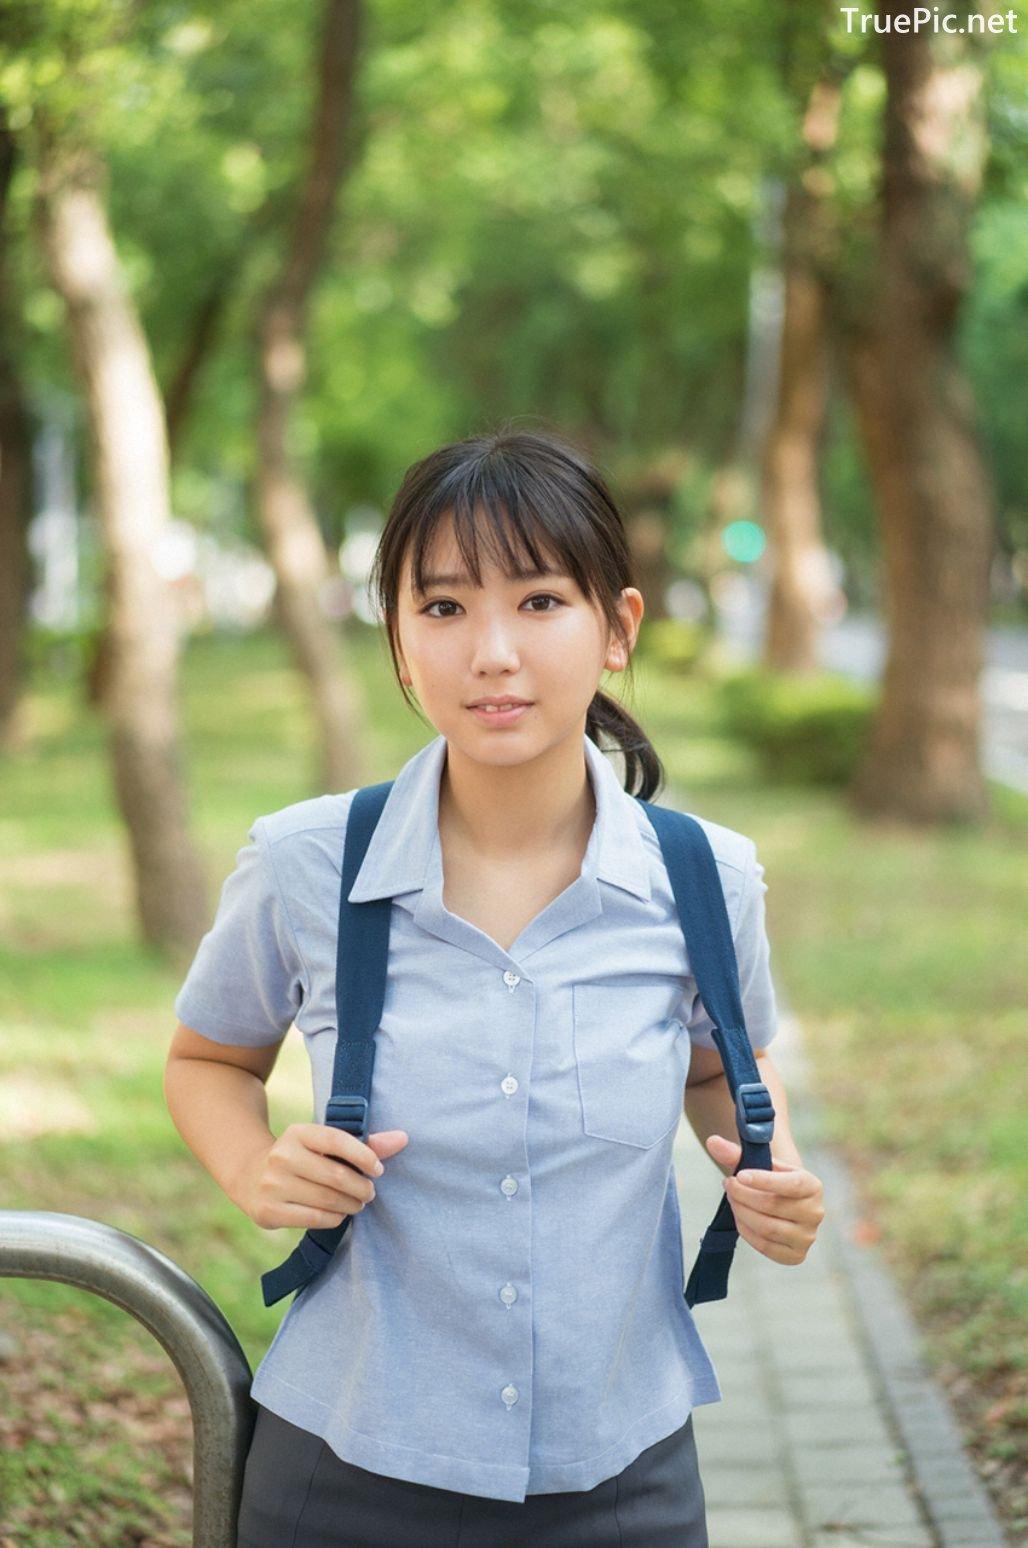 Image-Japanese-Pop-Idol-Aika-Sawaguchi-Girls-Revolution-TruePic.net- Picture-6